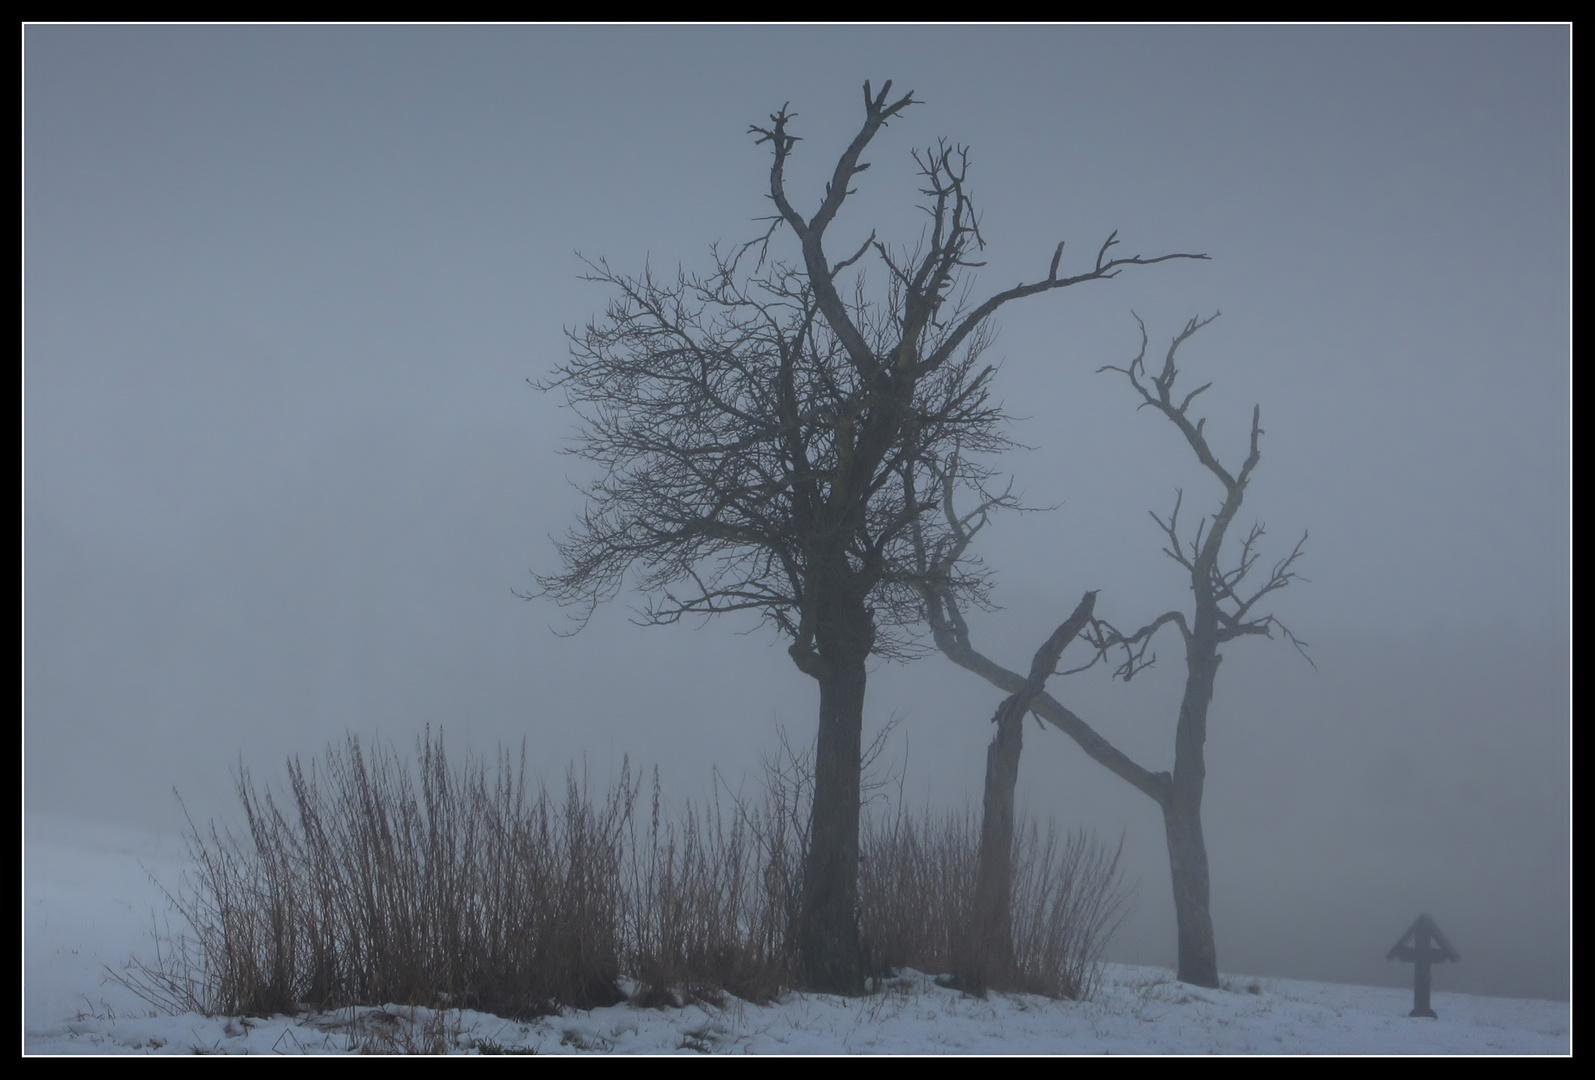 Winter - Impression 1